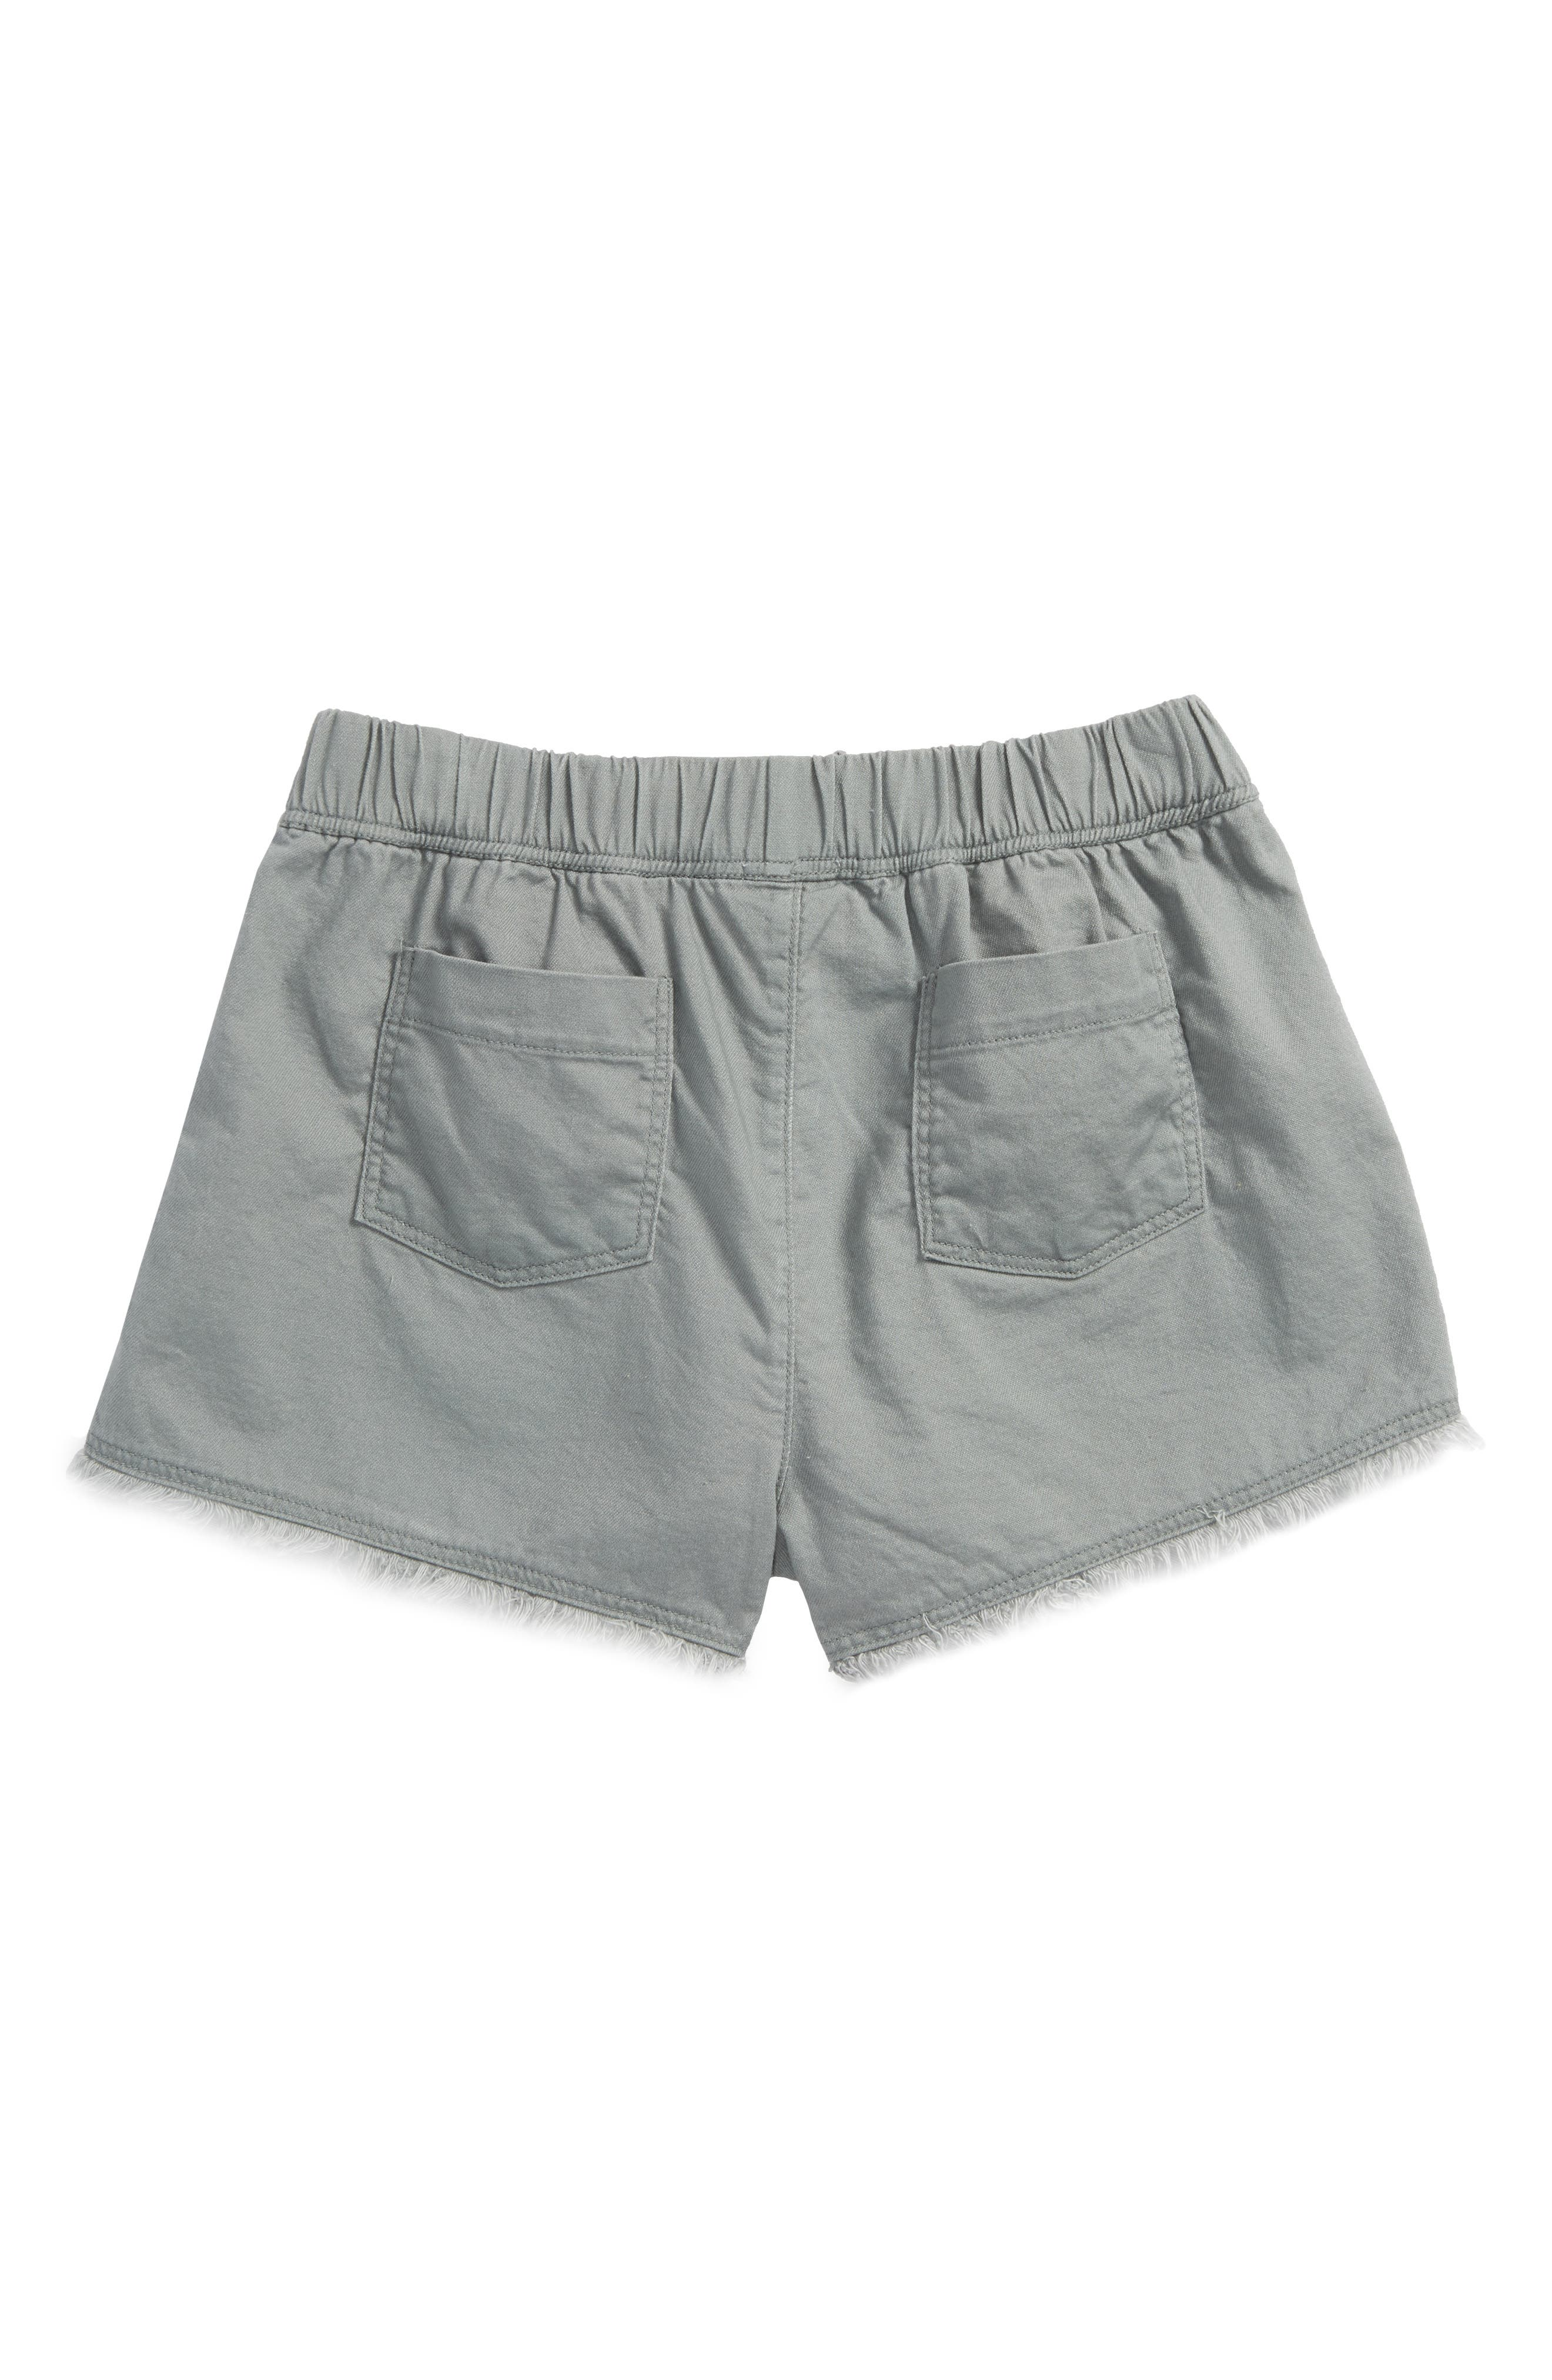 Twill Shorts,                             Alternate thumbnail 2, color,